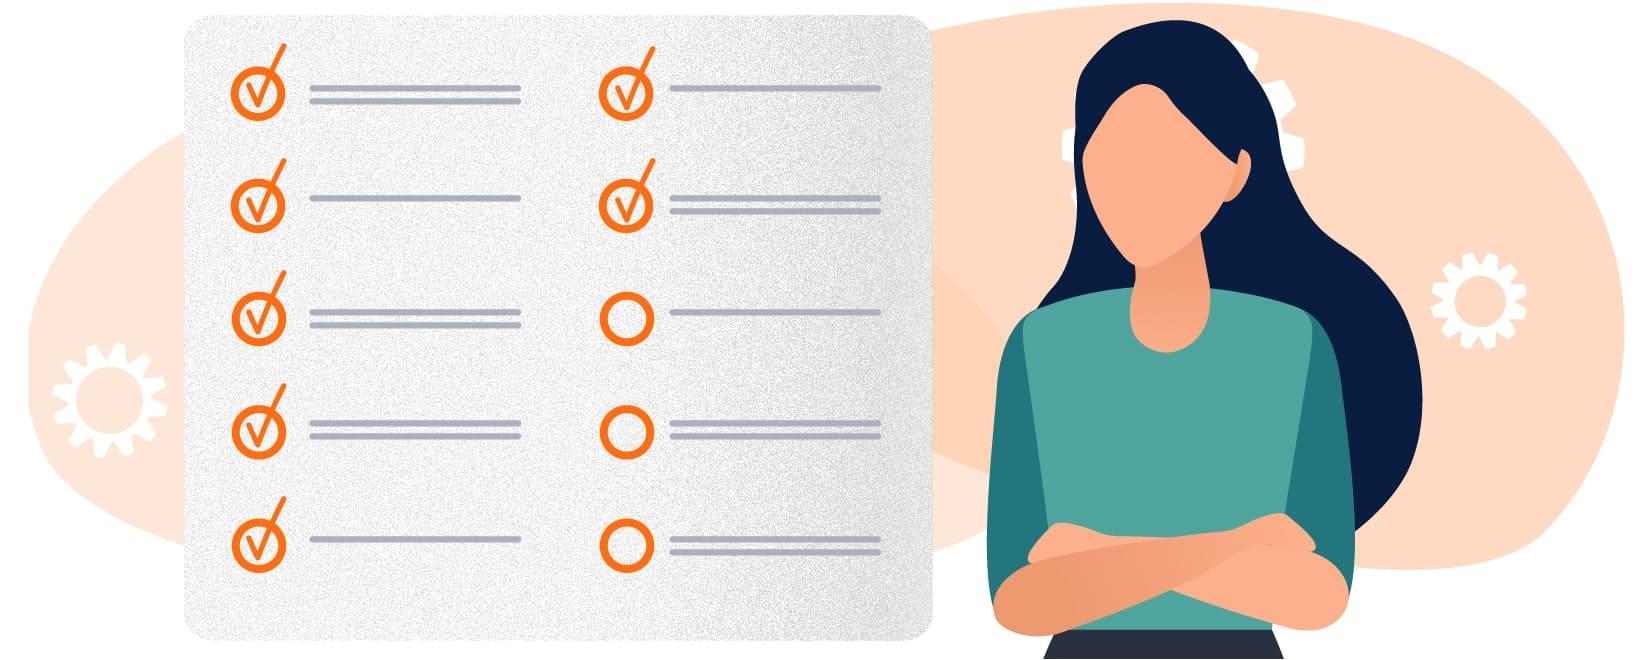 Hurma Blog: A great technical recruiter - 10 skills